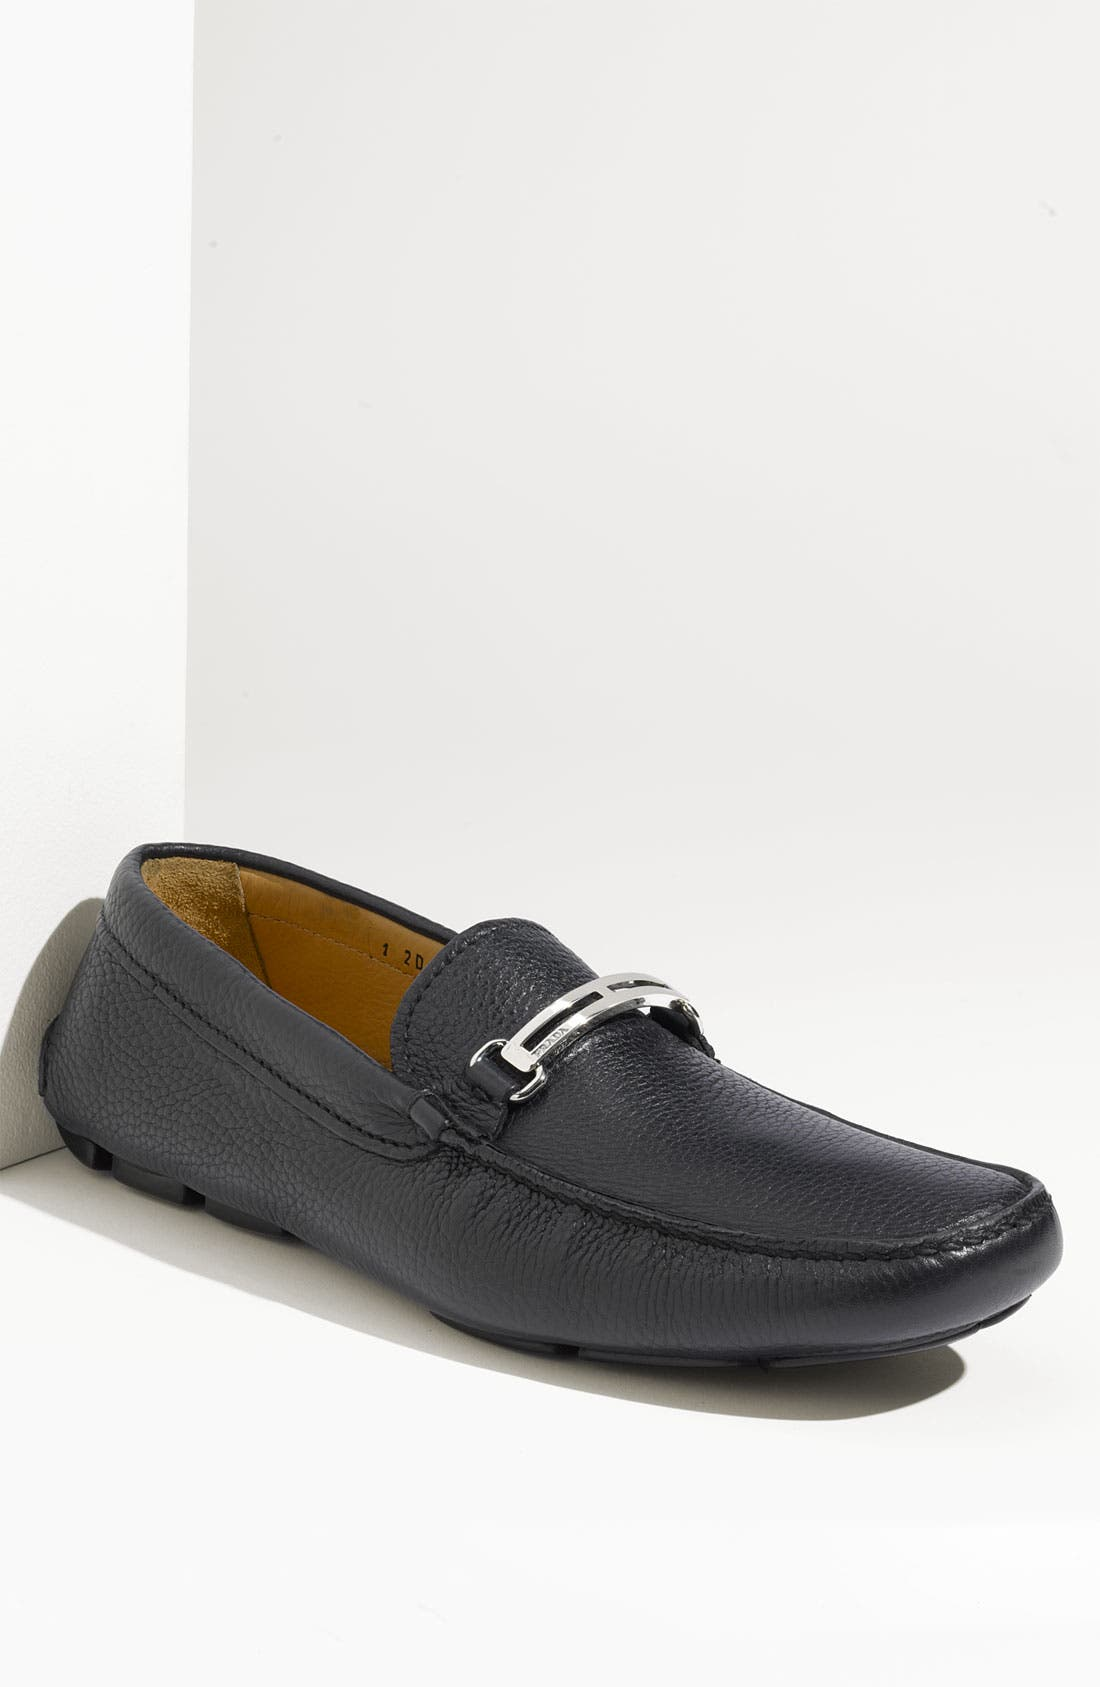 Alternate Image 1 Selected - Prada Driving Shoe (Men) (Nordstrom Exclusive)